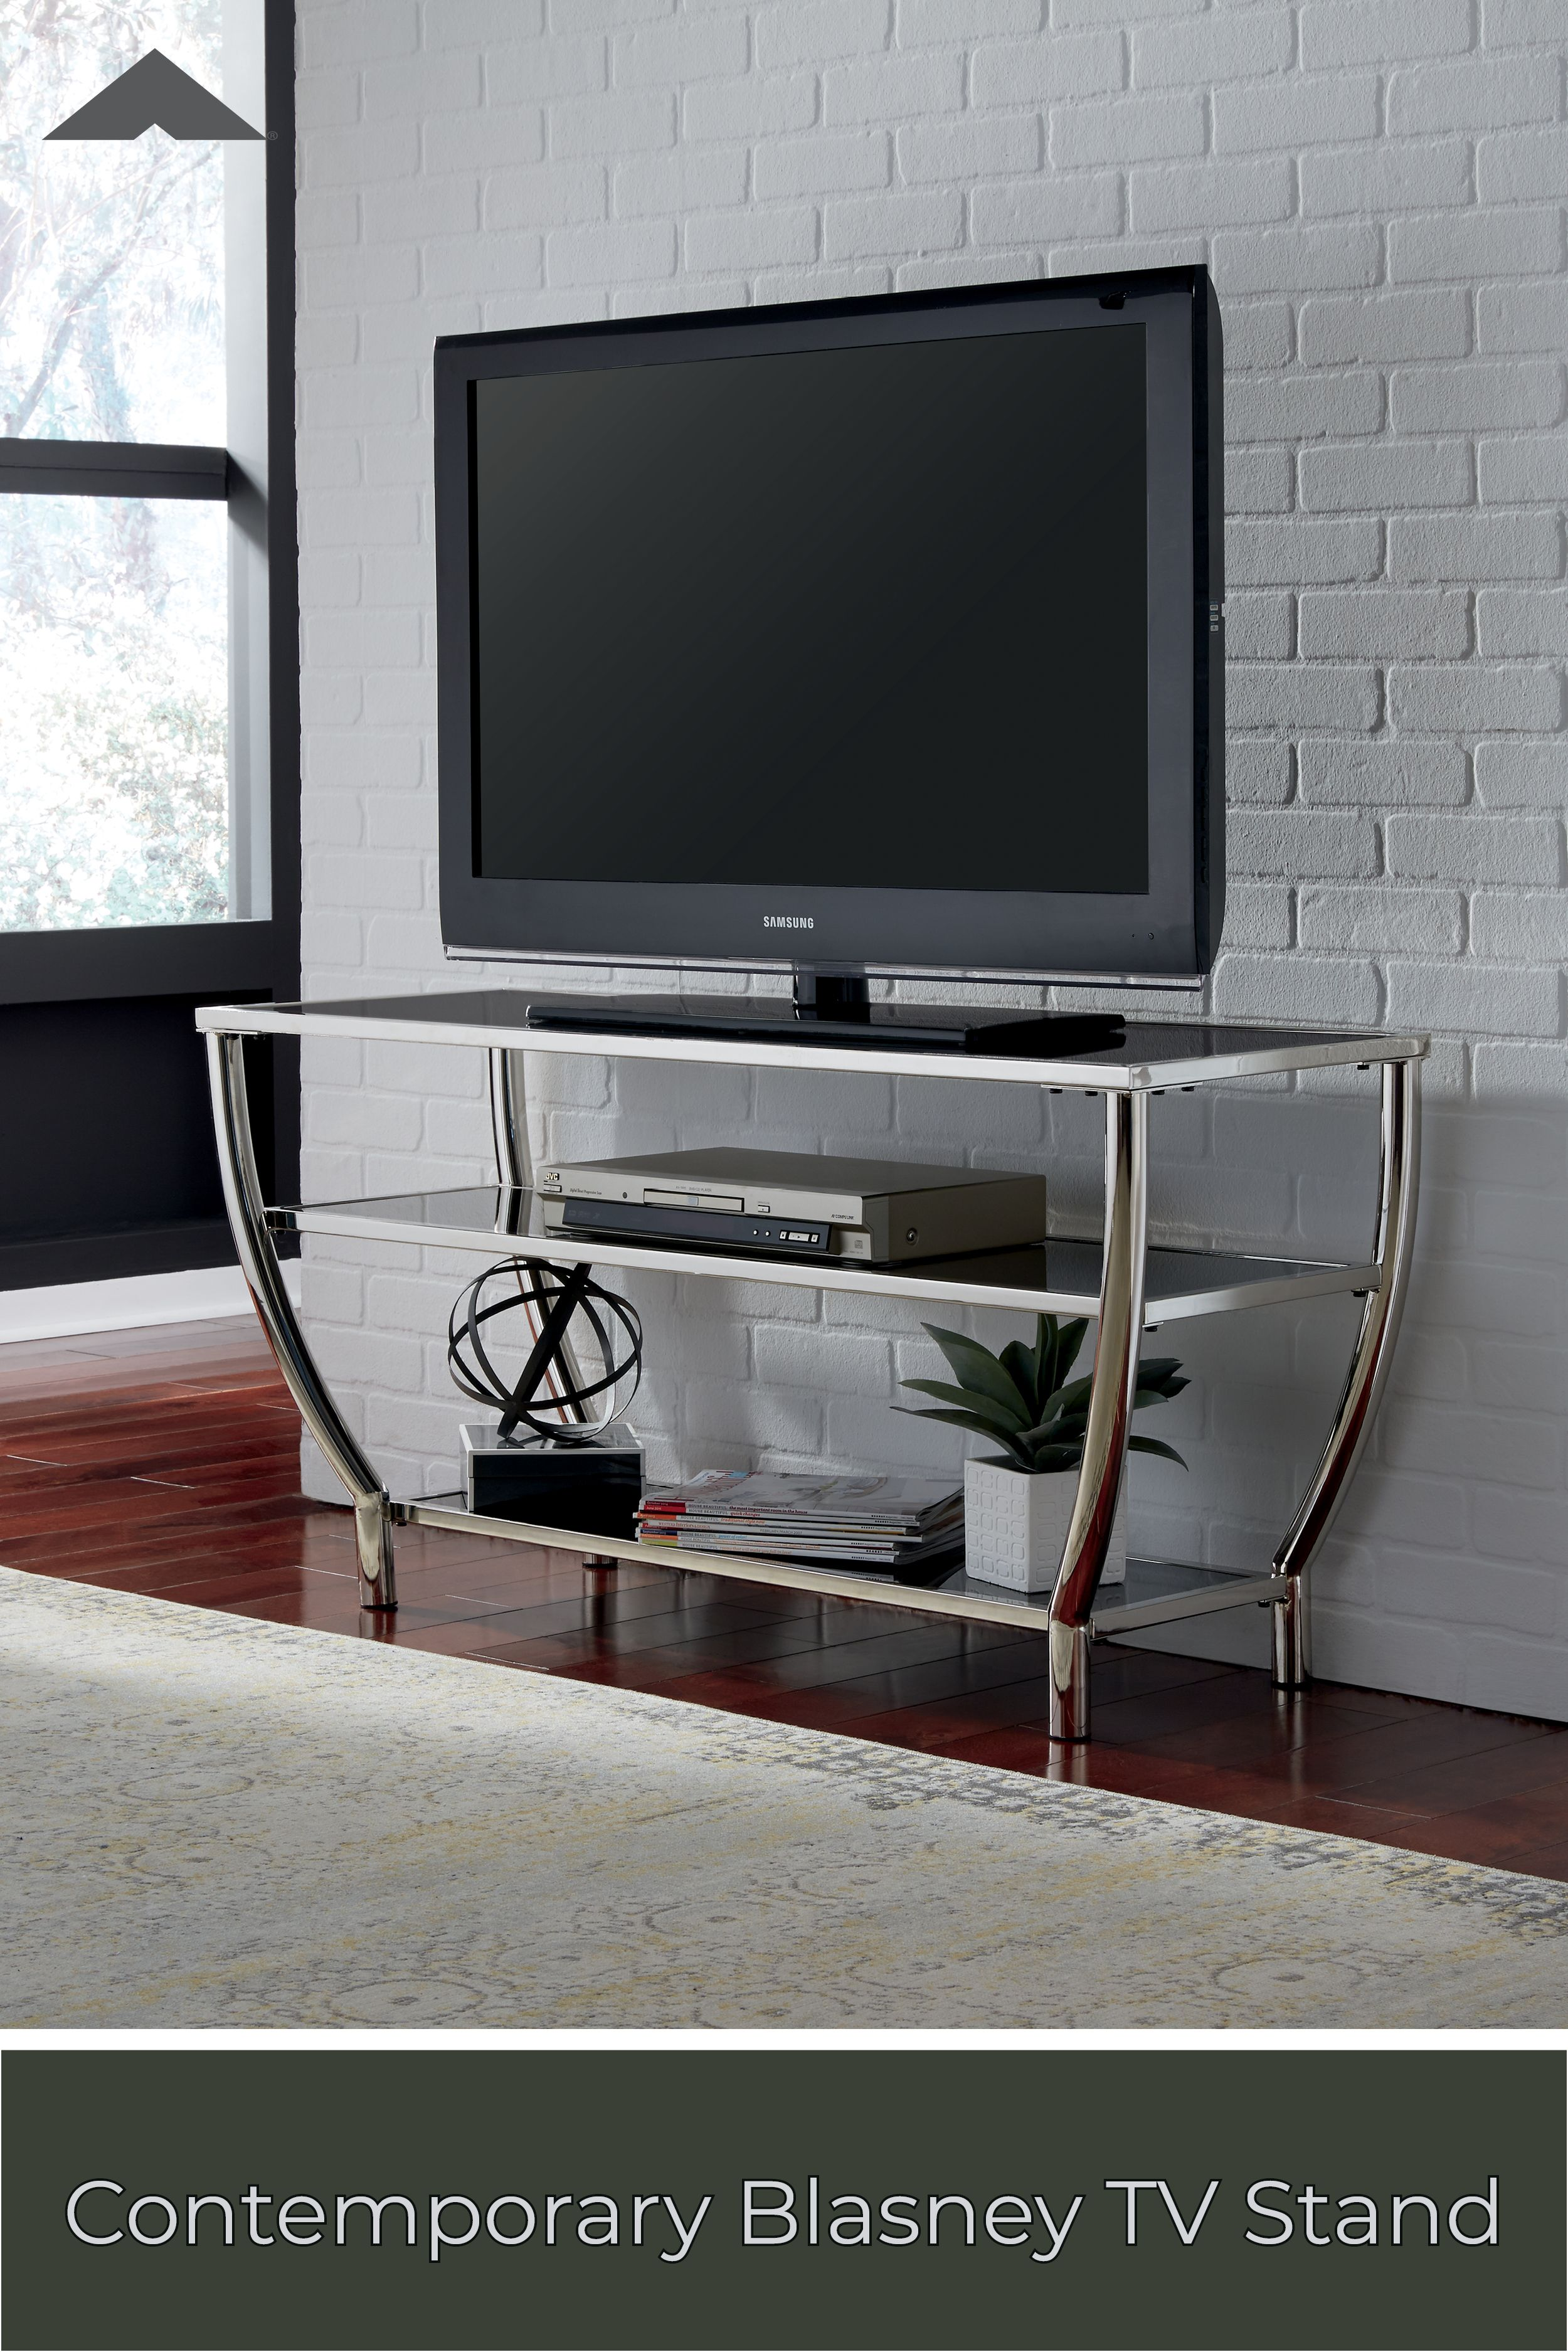 Blasney Black And Chrome Finish Tv Stand By Ashley Furniture Ashleyfurniture Livingroomdecor Livi Living Room Tv Stand Living Room Designs Glass Tv Stand